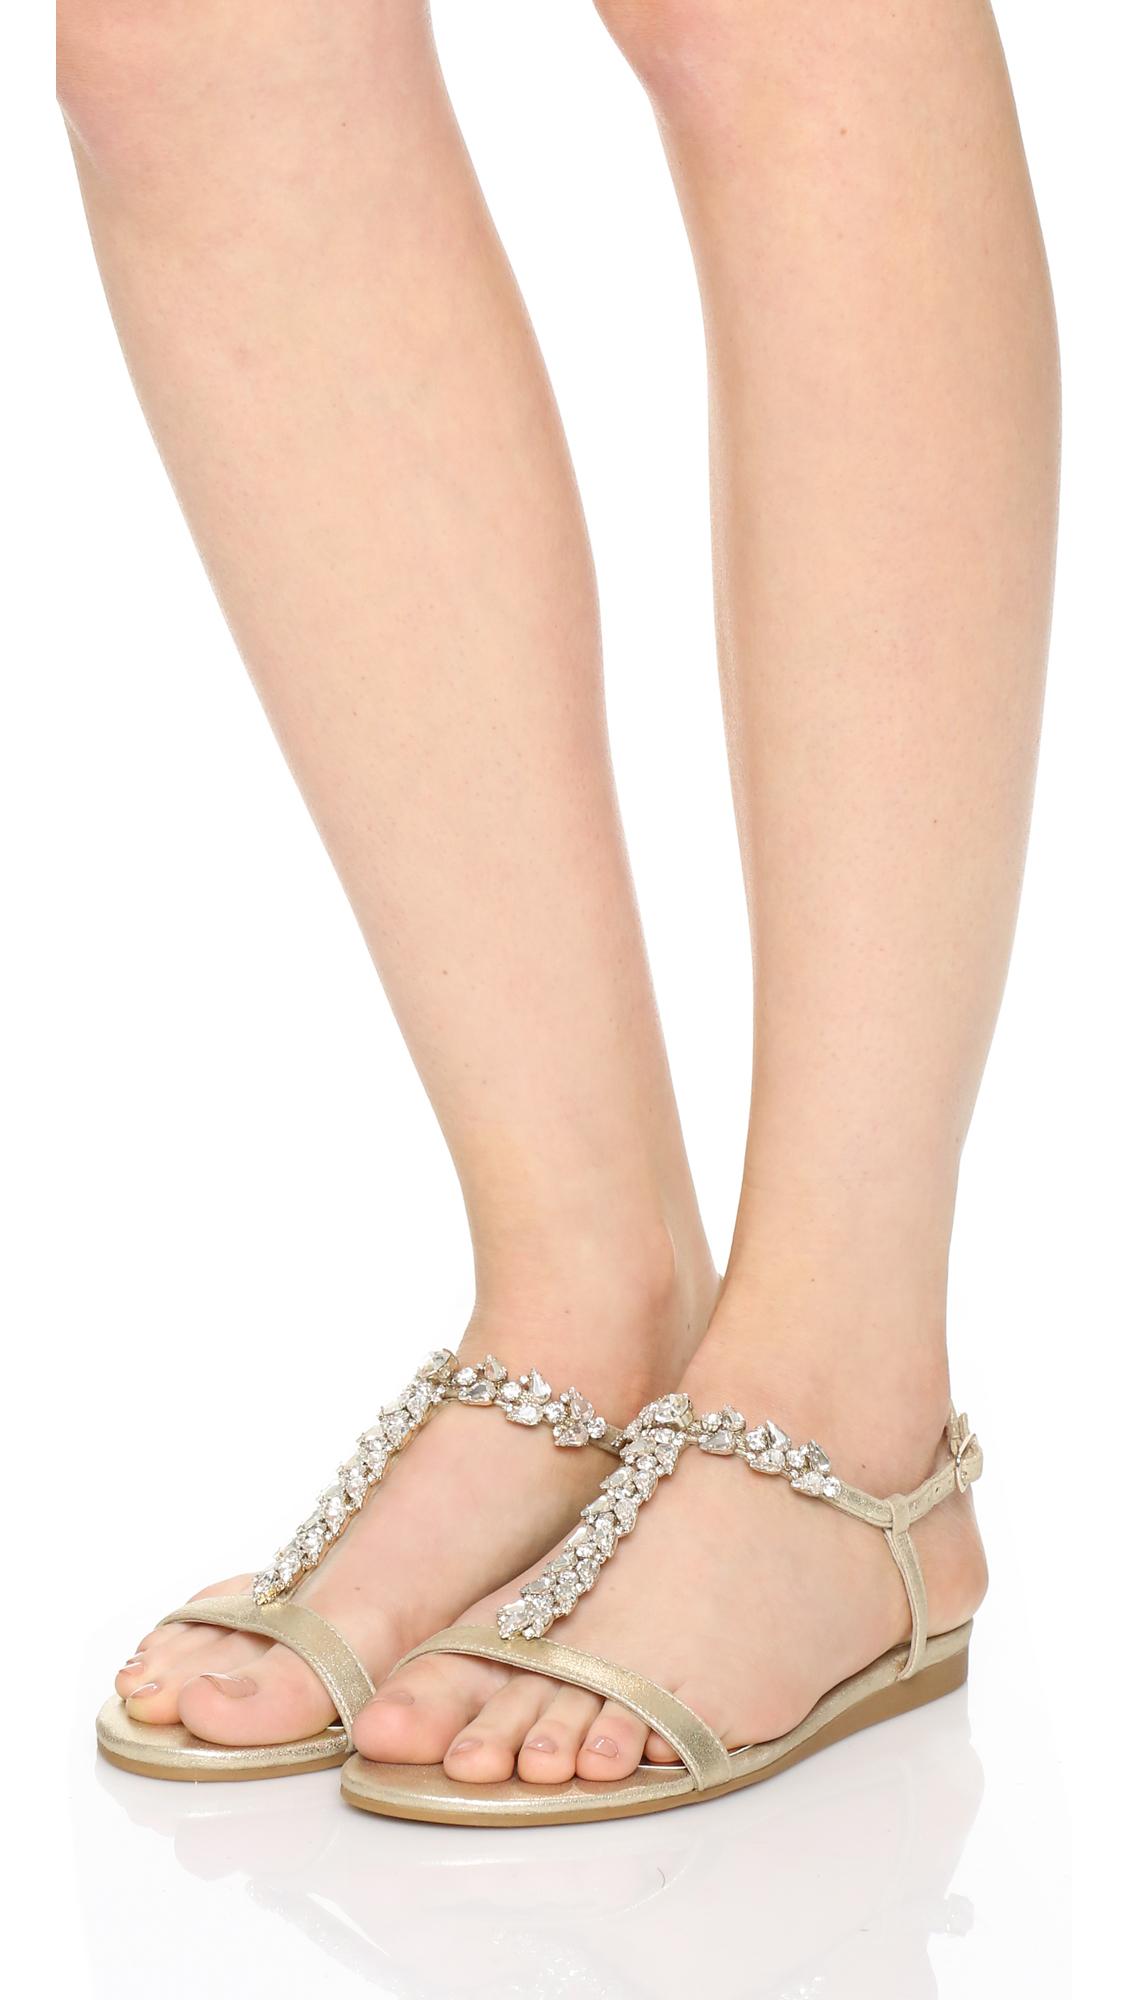 Lyst Badgley Mischka Amuse Flat Sandals In Metallic